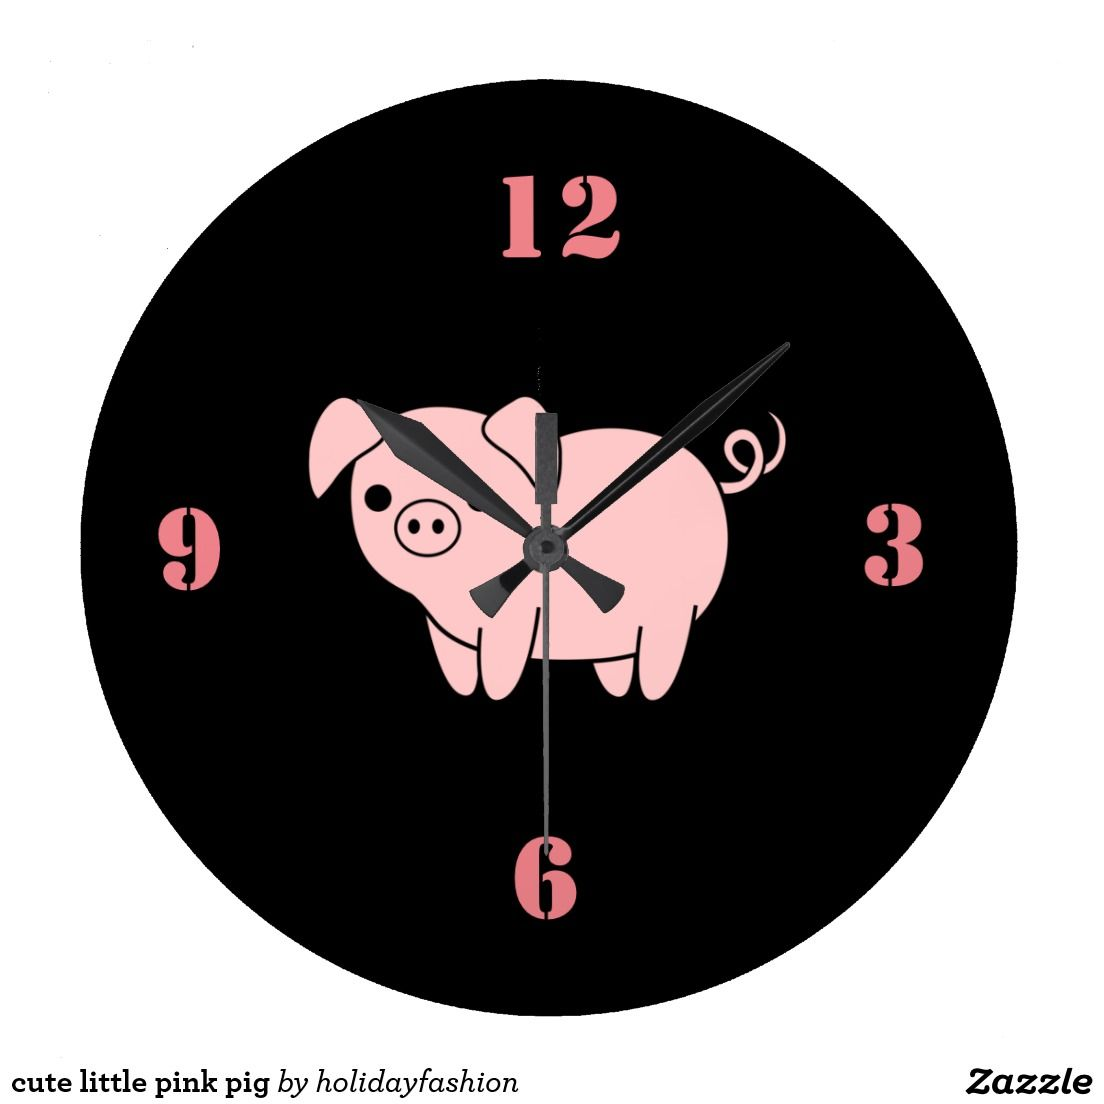 cute little pink pig large clock